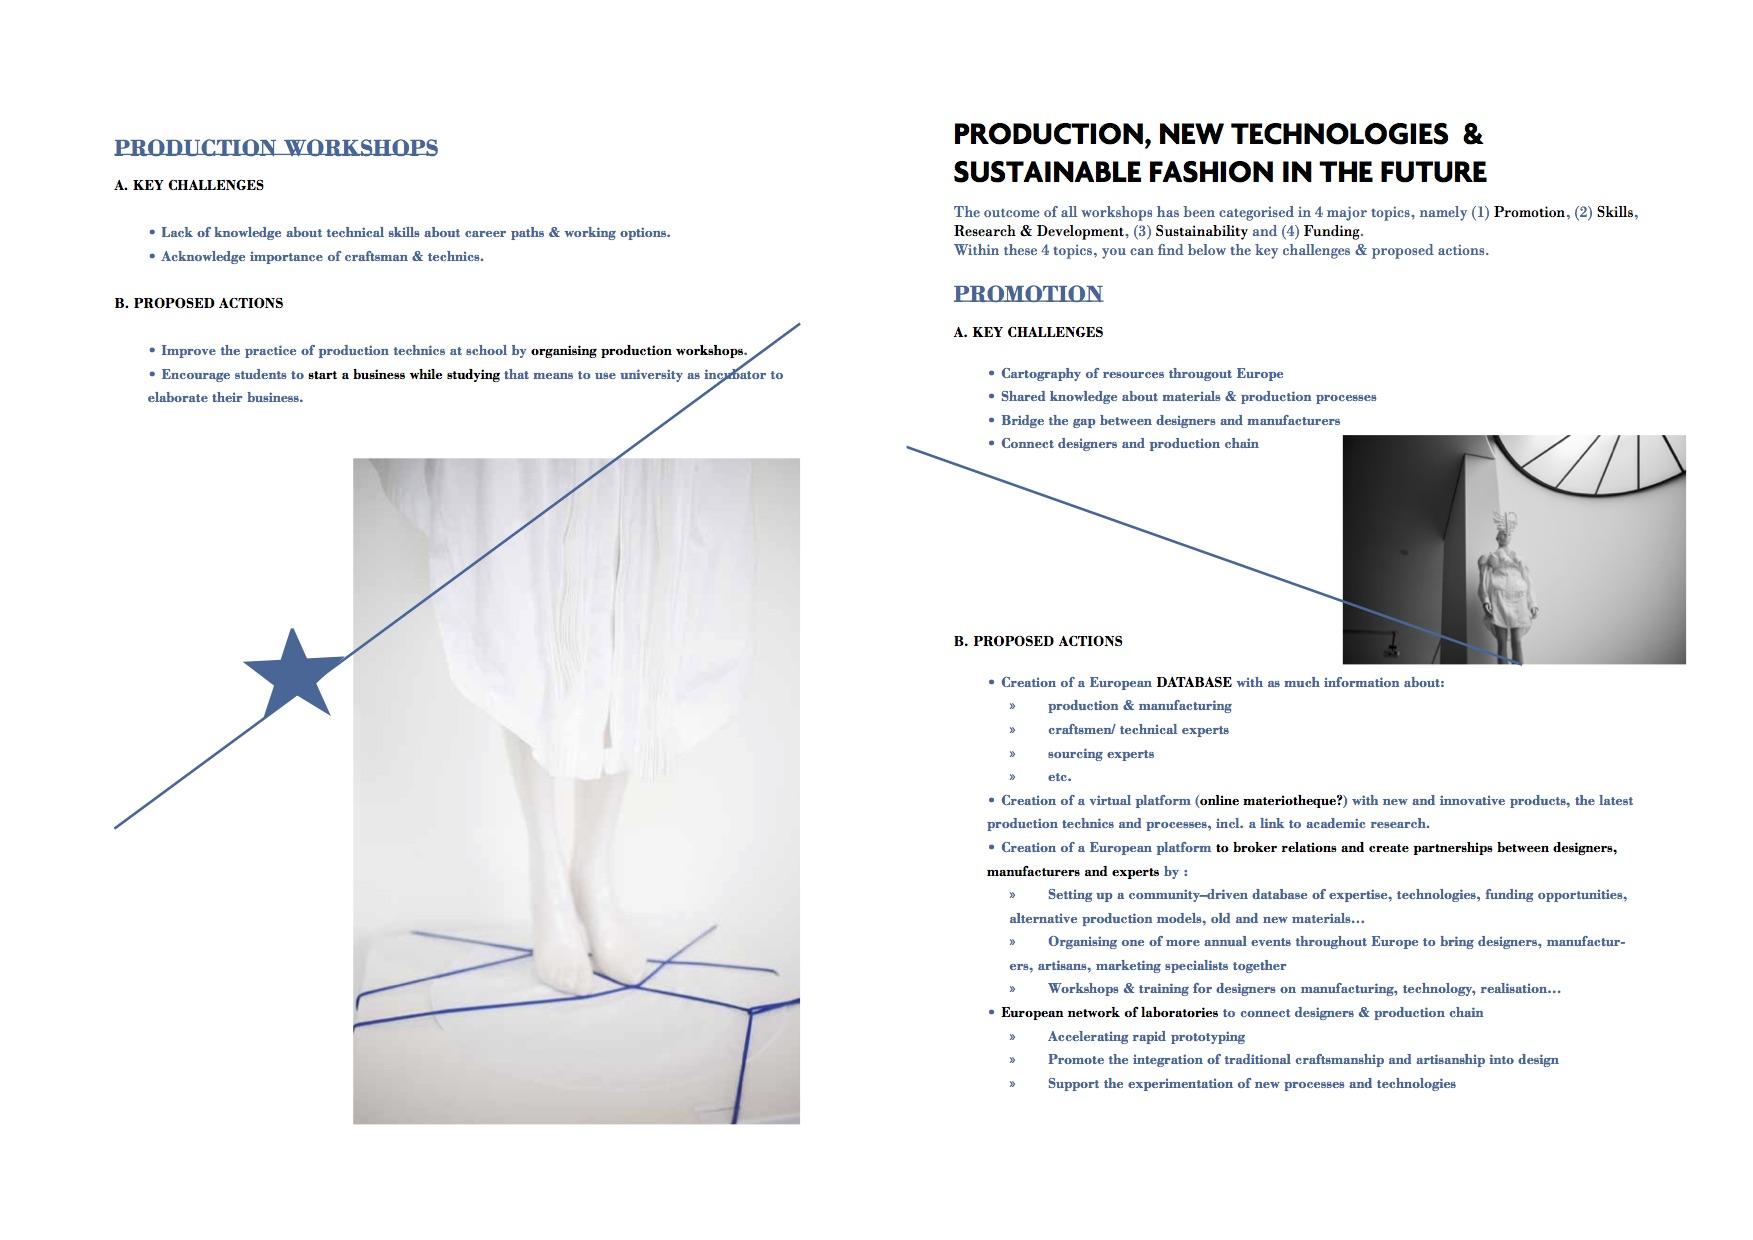 MADIFESTO CONCLUSIONS 2014-4.jpg